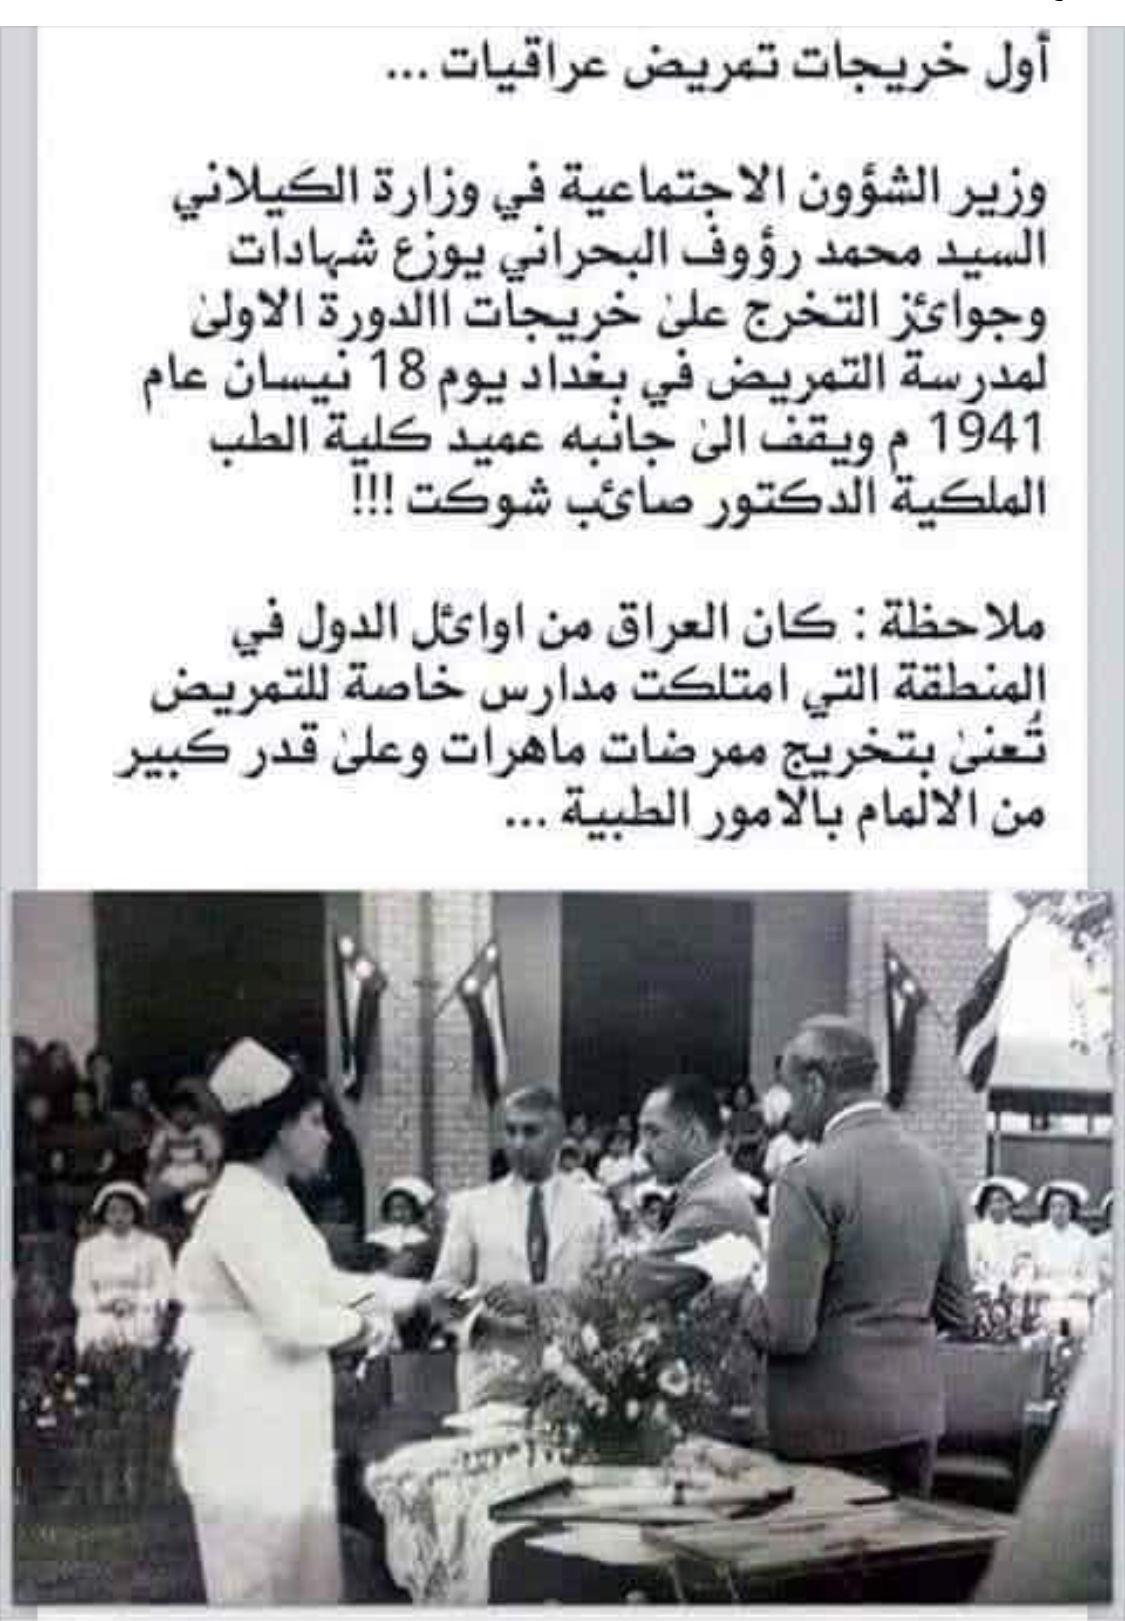 Pin On Iraq Memories